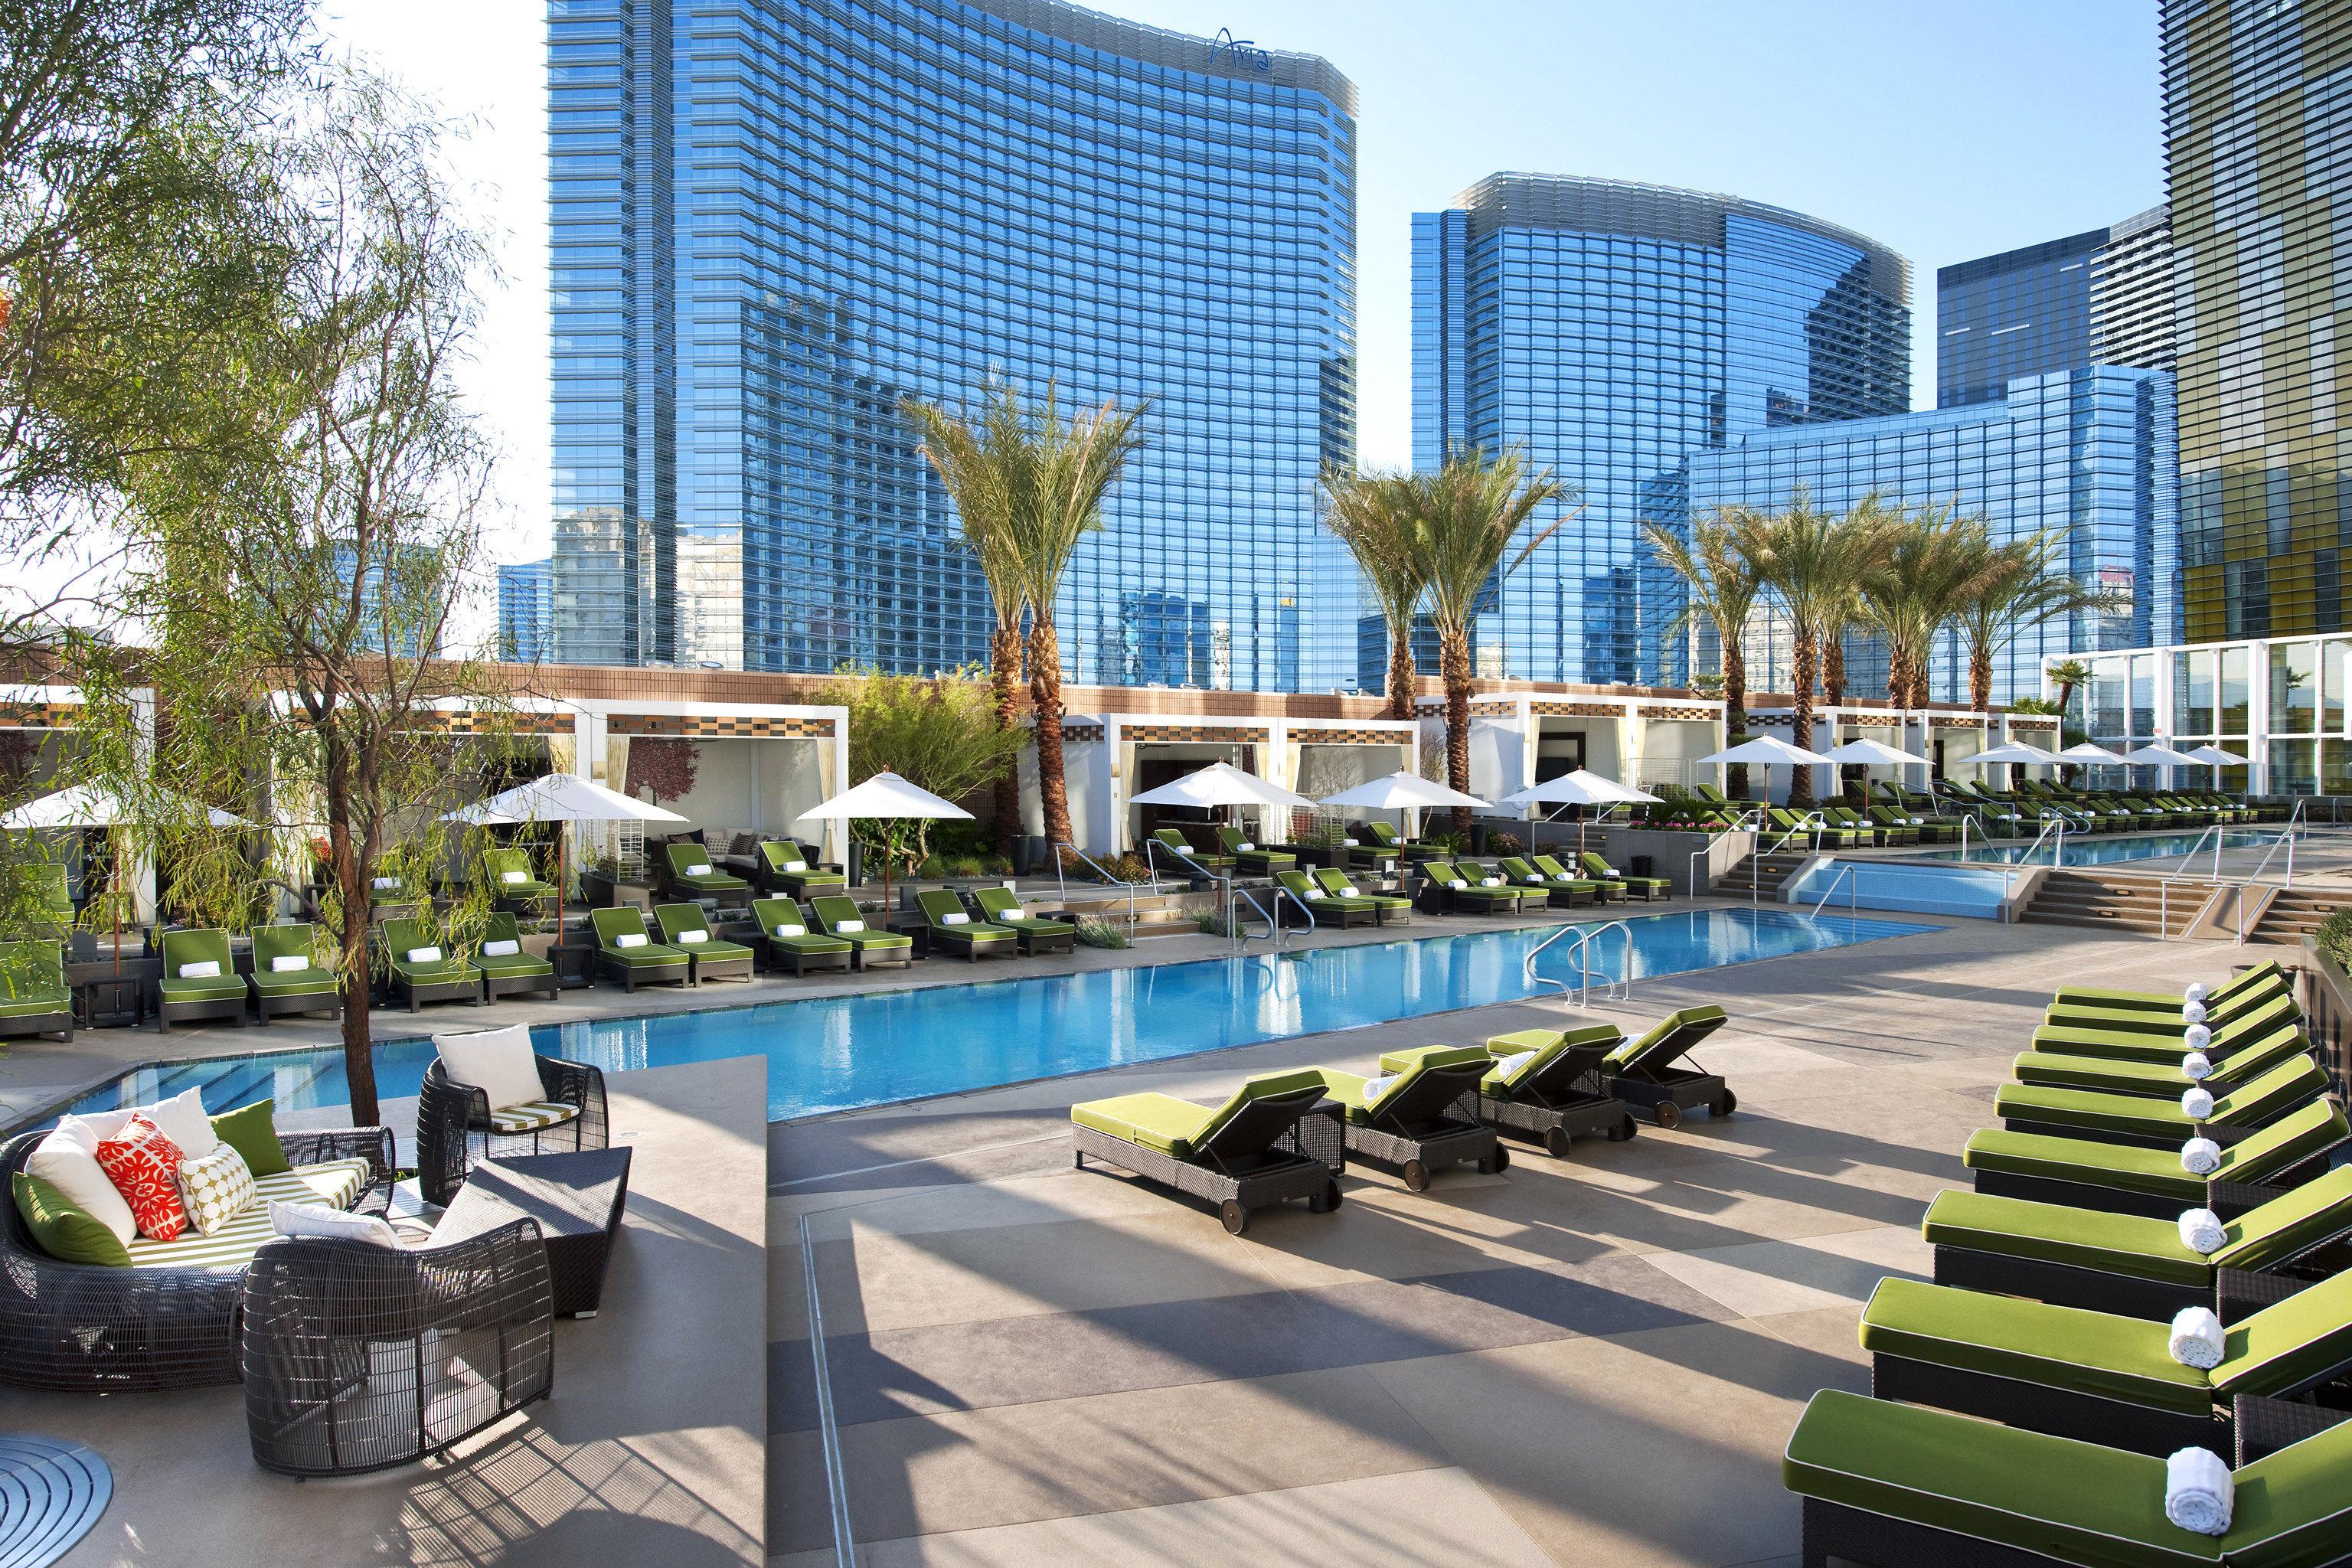 Elegant Lounge Luxury Outdoors Patio Pool Resort tree condominium leisure plaza property swimming pool reflecting pool marina walkway dock urban design